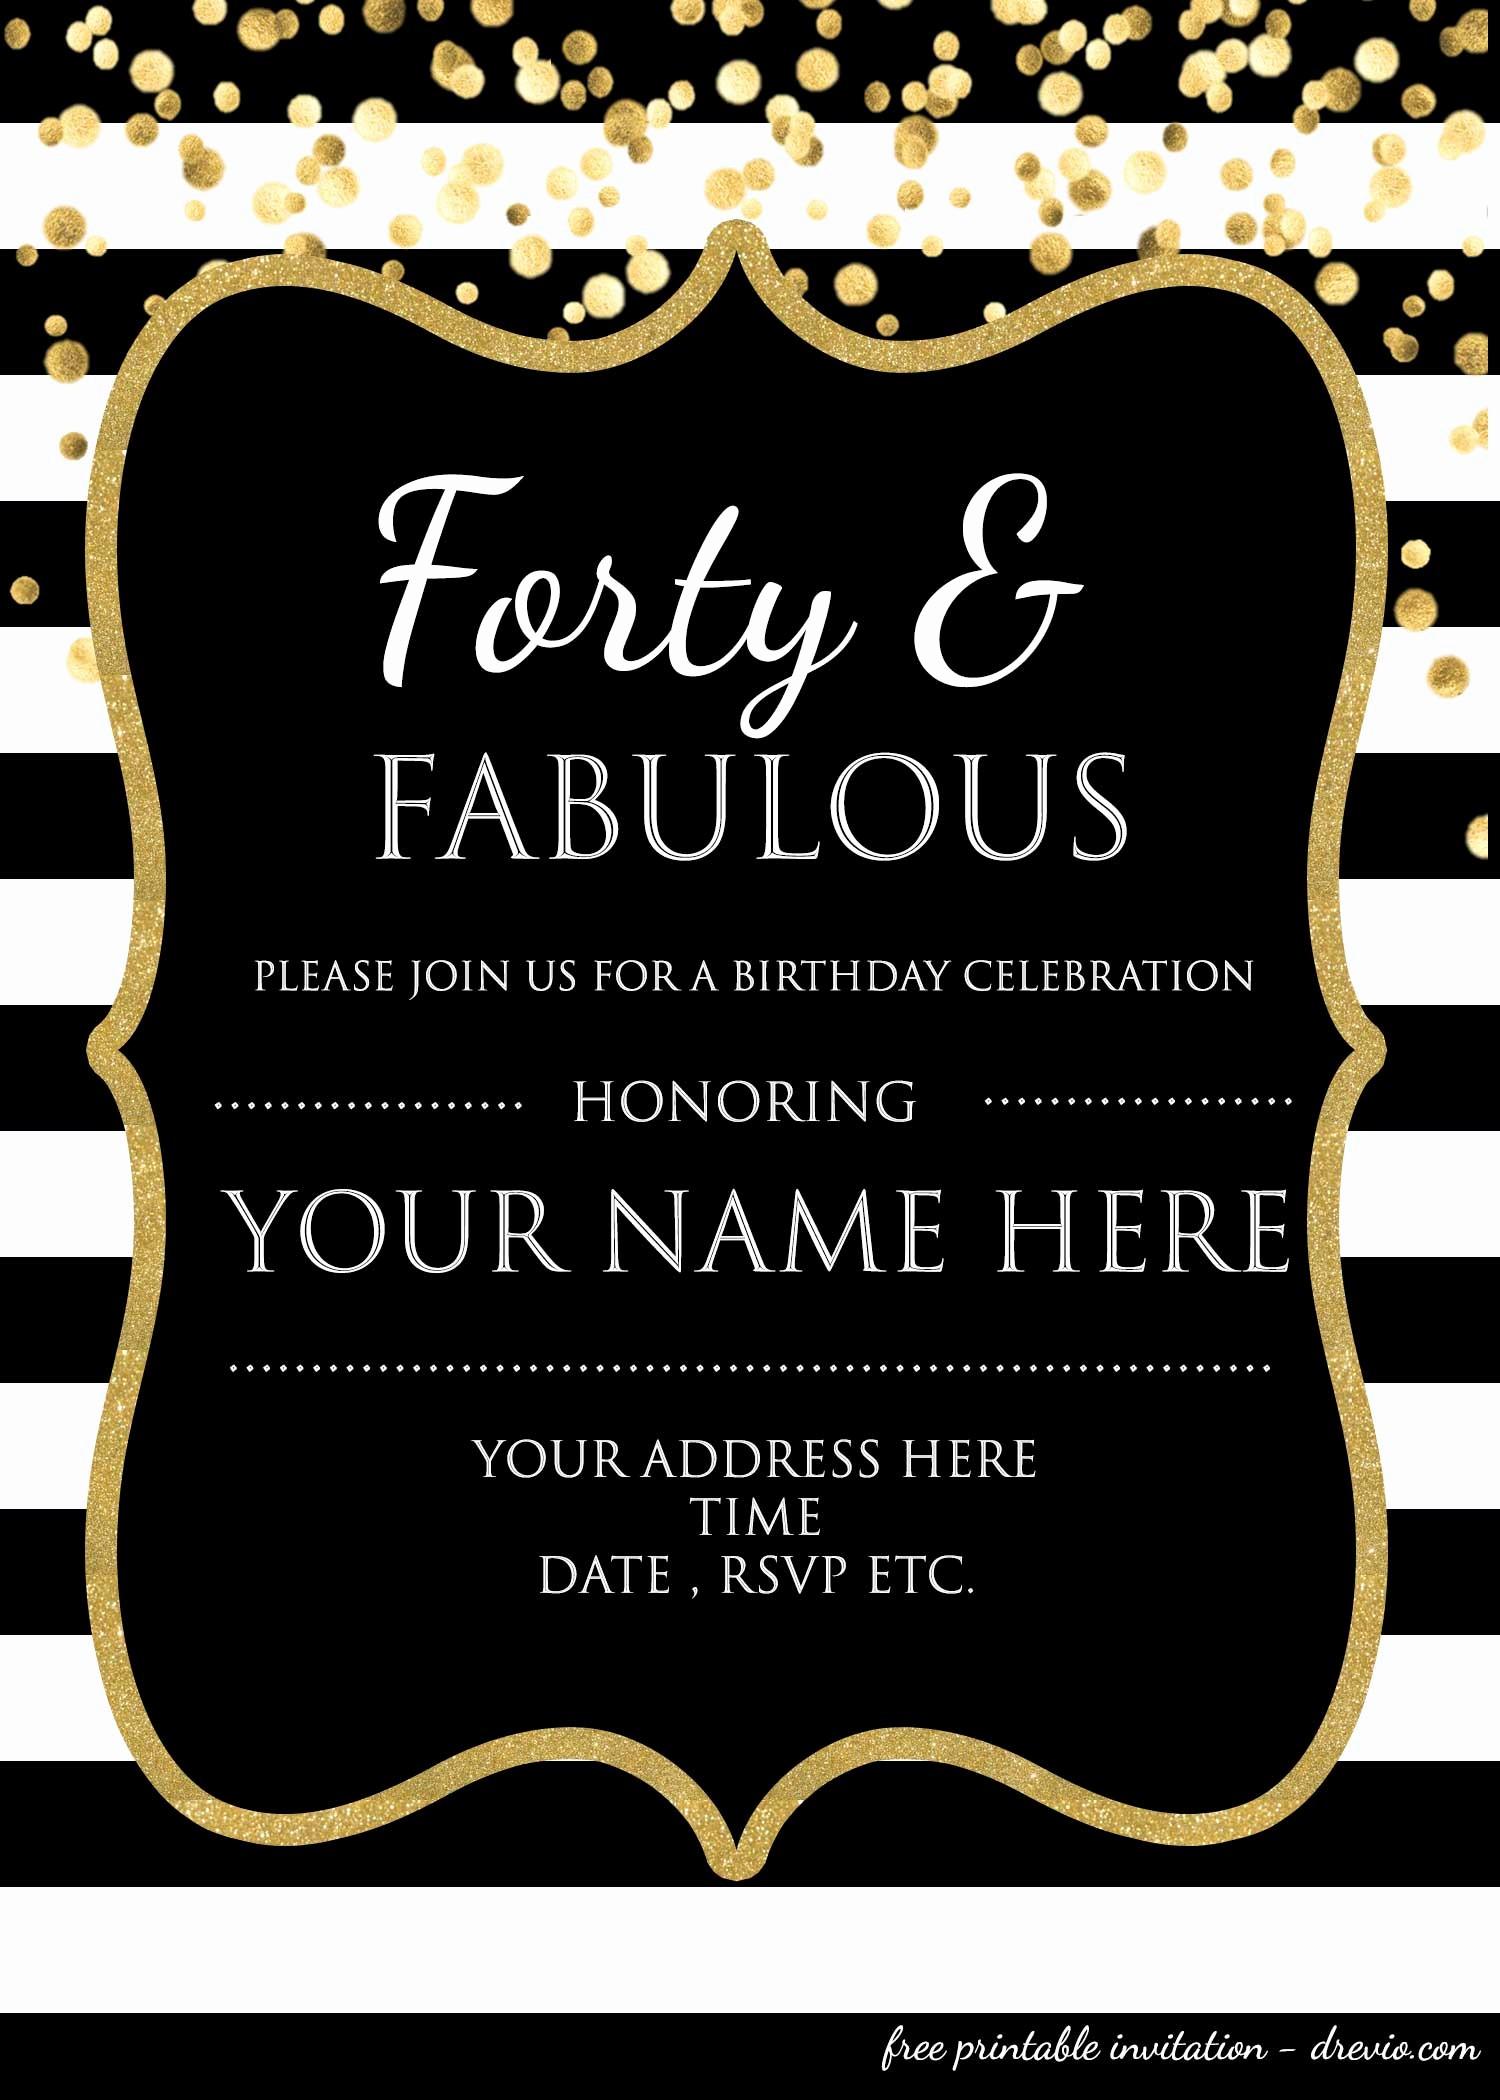 Free Templates for Birthday Invitations Fresh 40th Birthday Invitation Template – Free – Free Printable